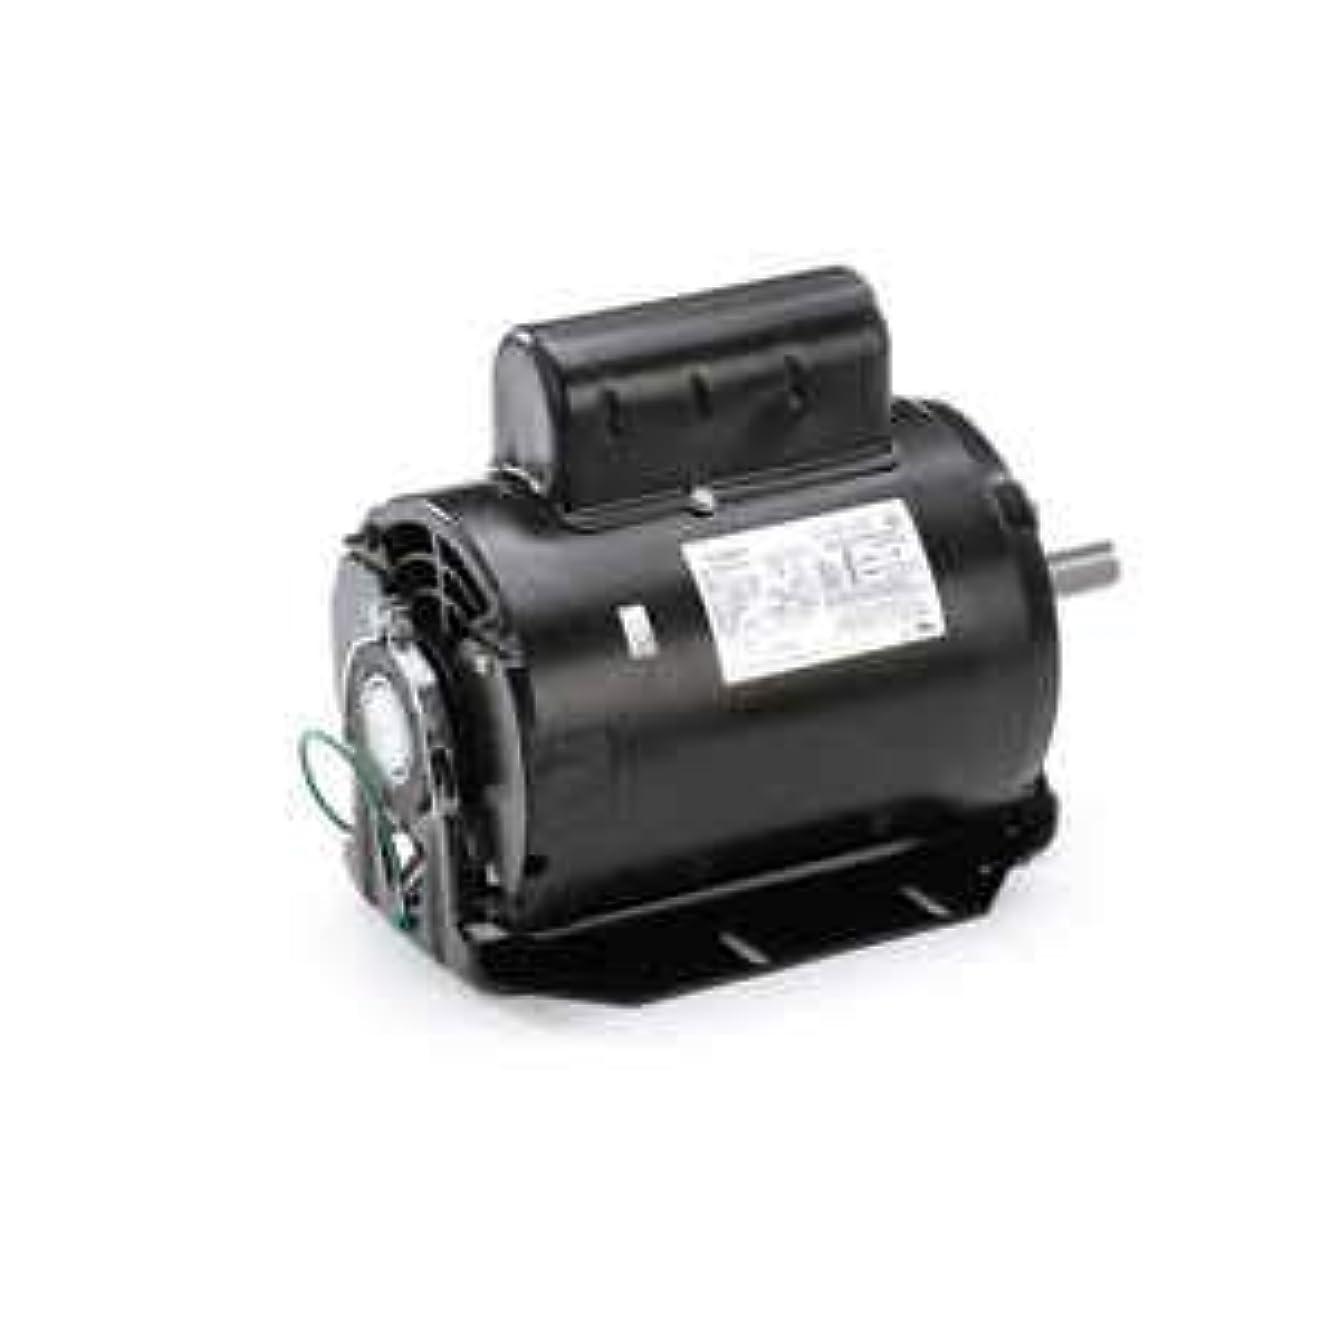 Evaporative Cooler Motor, 1-7/8 In. L